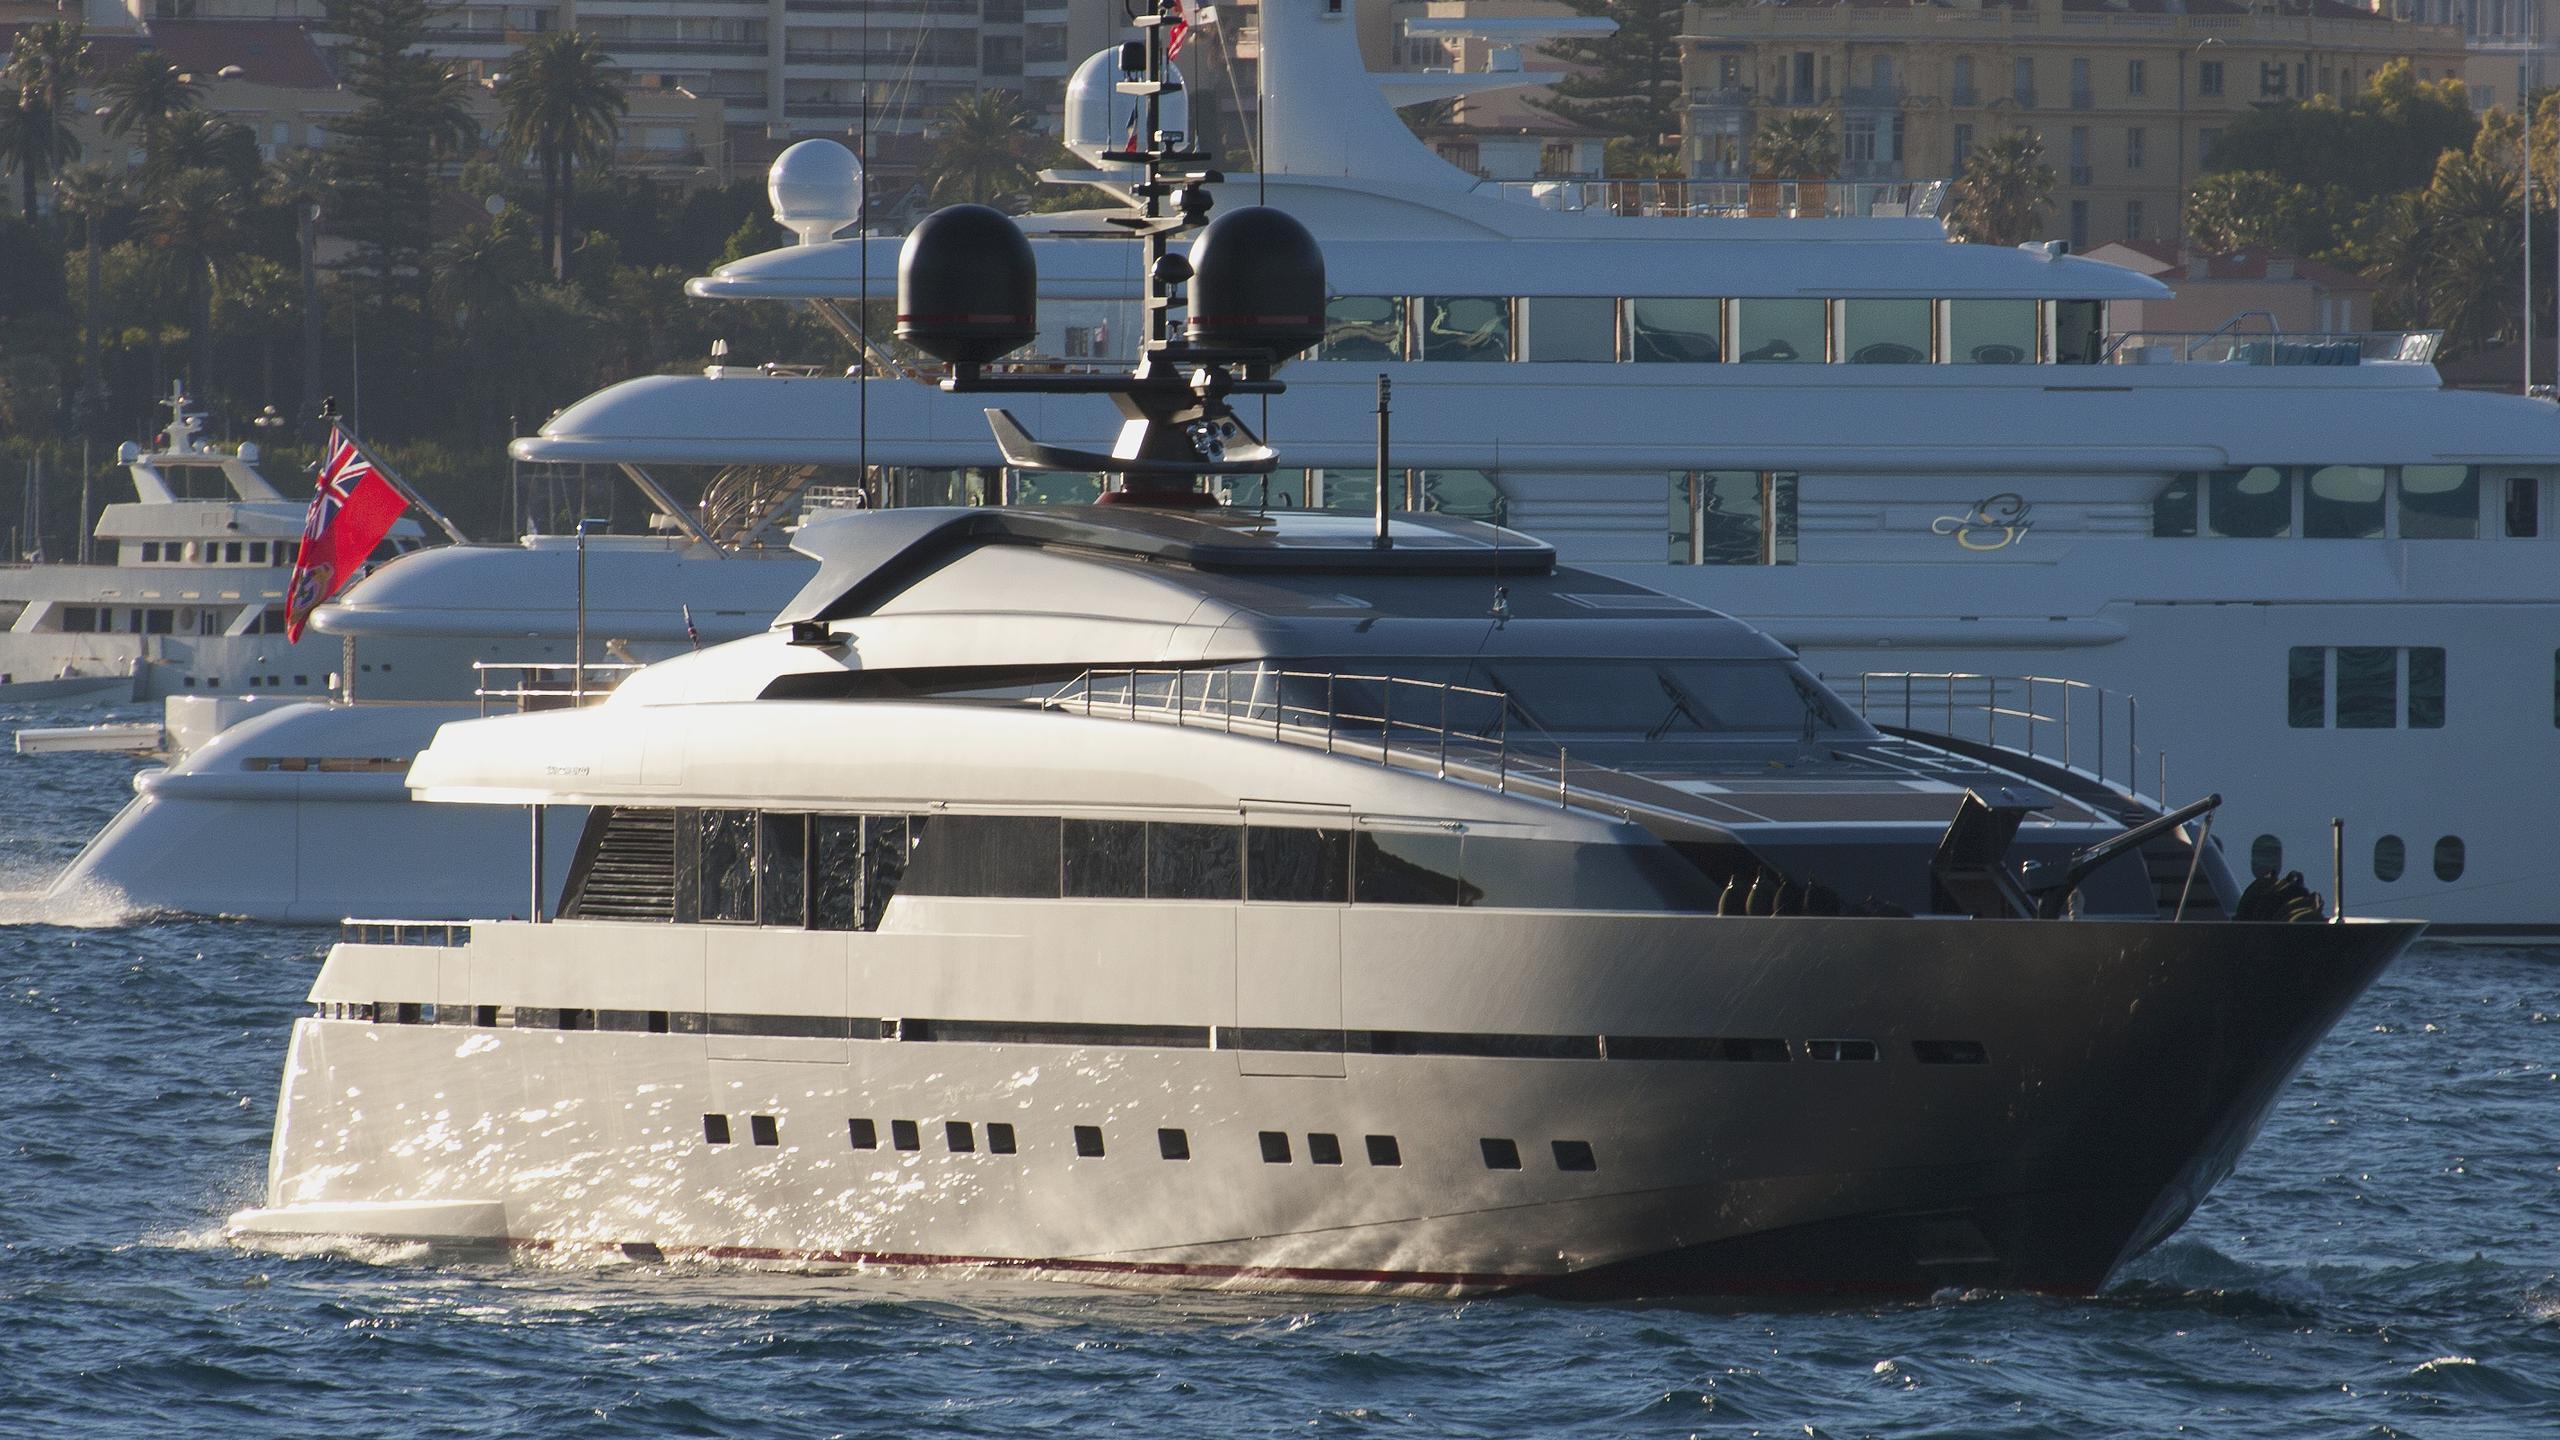 tesoro scorpion motoryacht sanlorenzo alloy 40m 2011 half profile